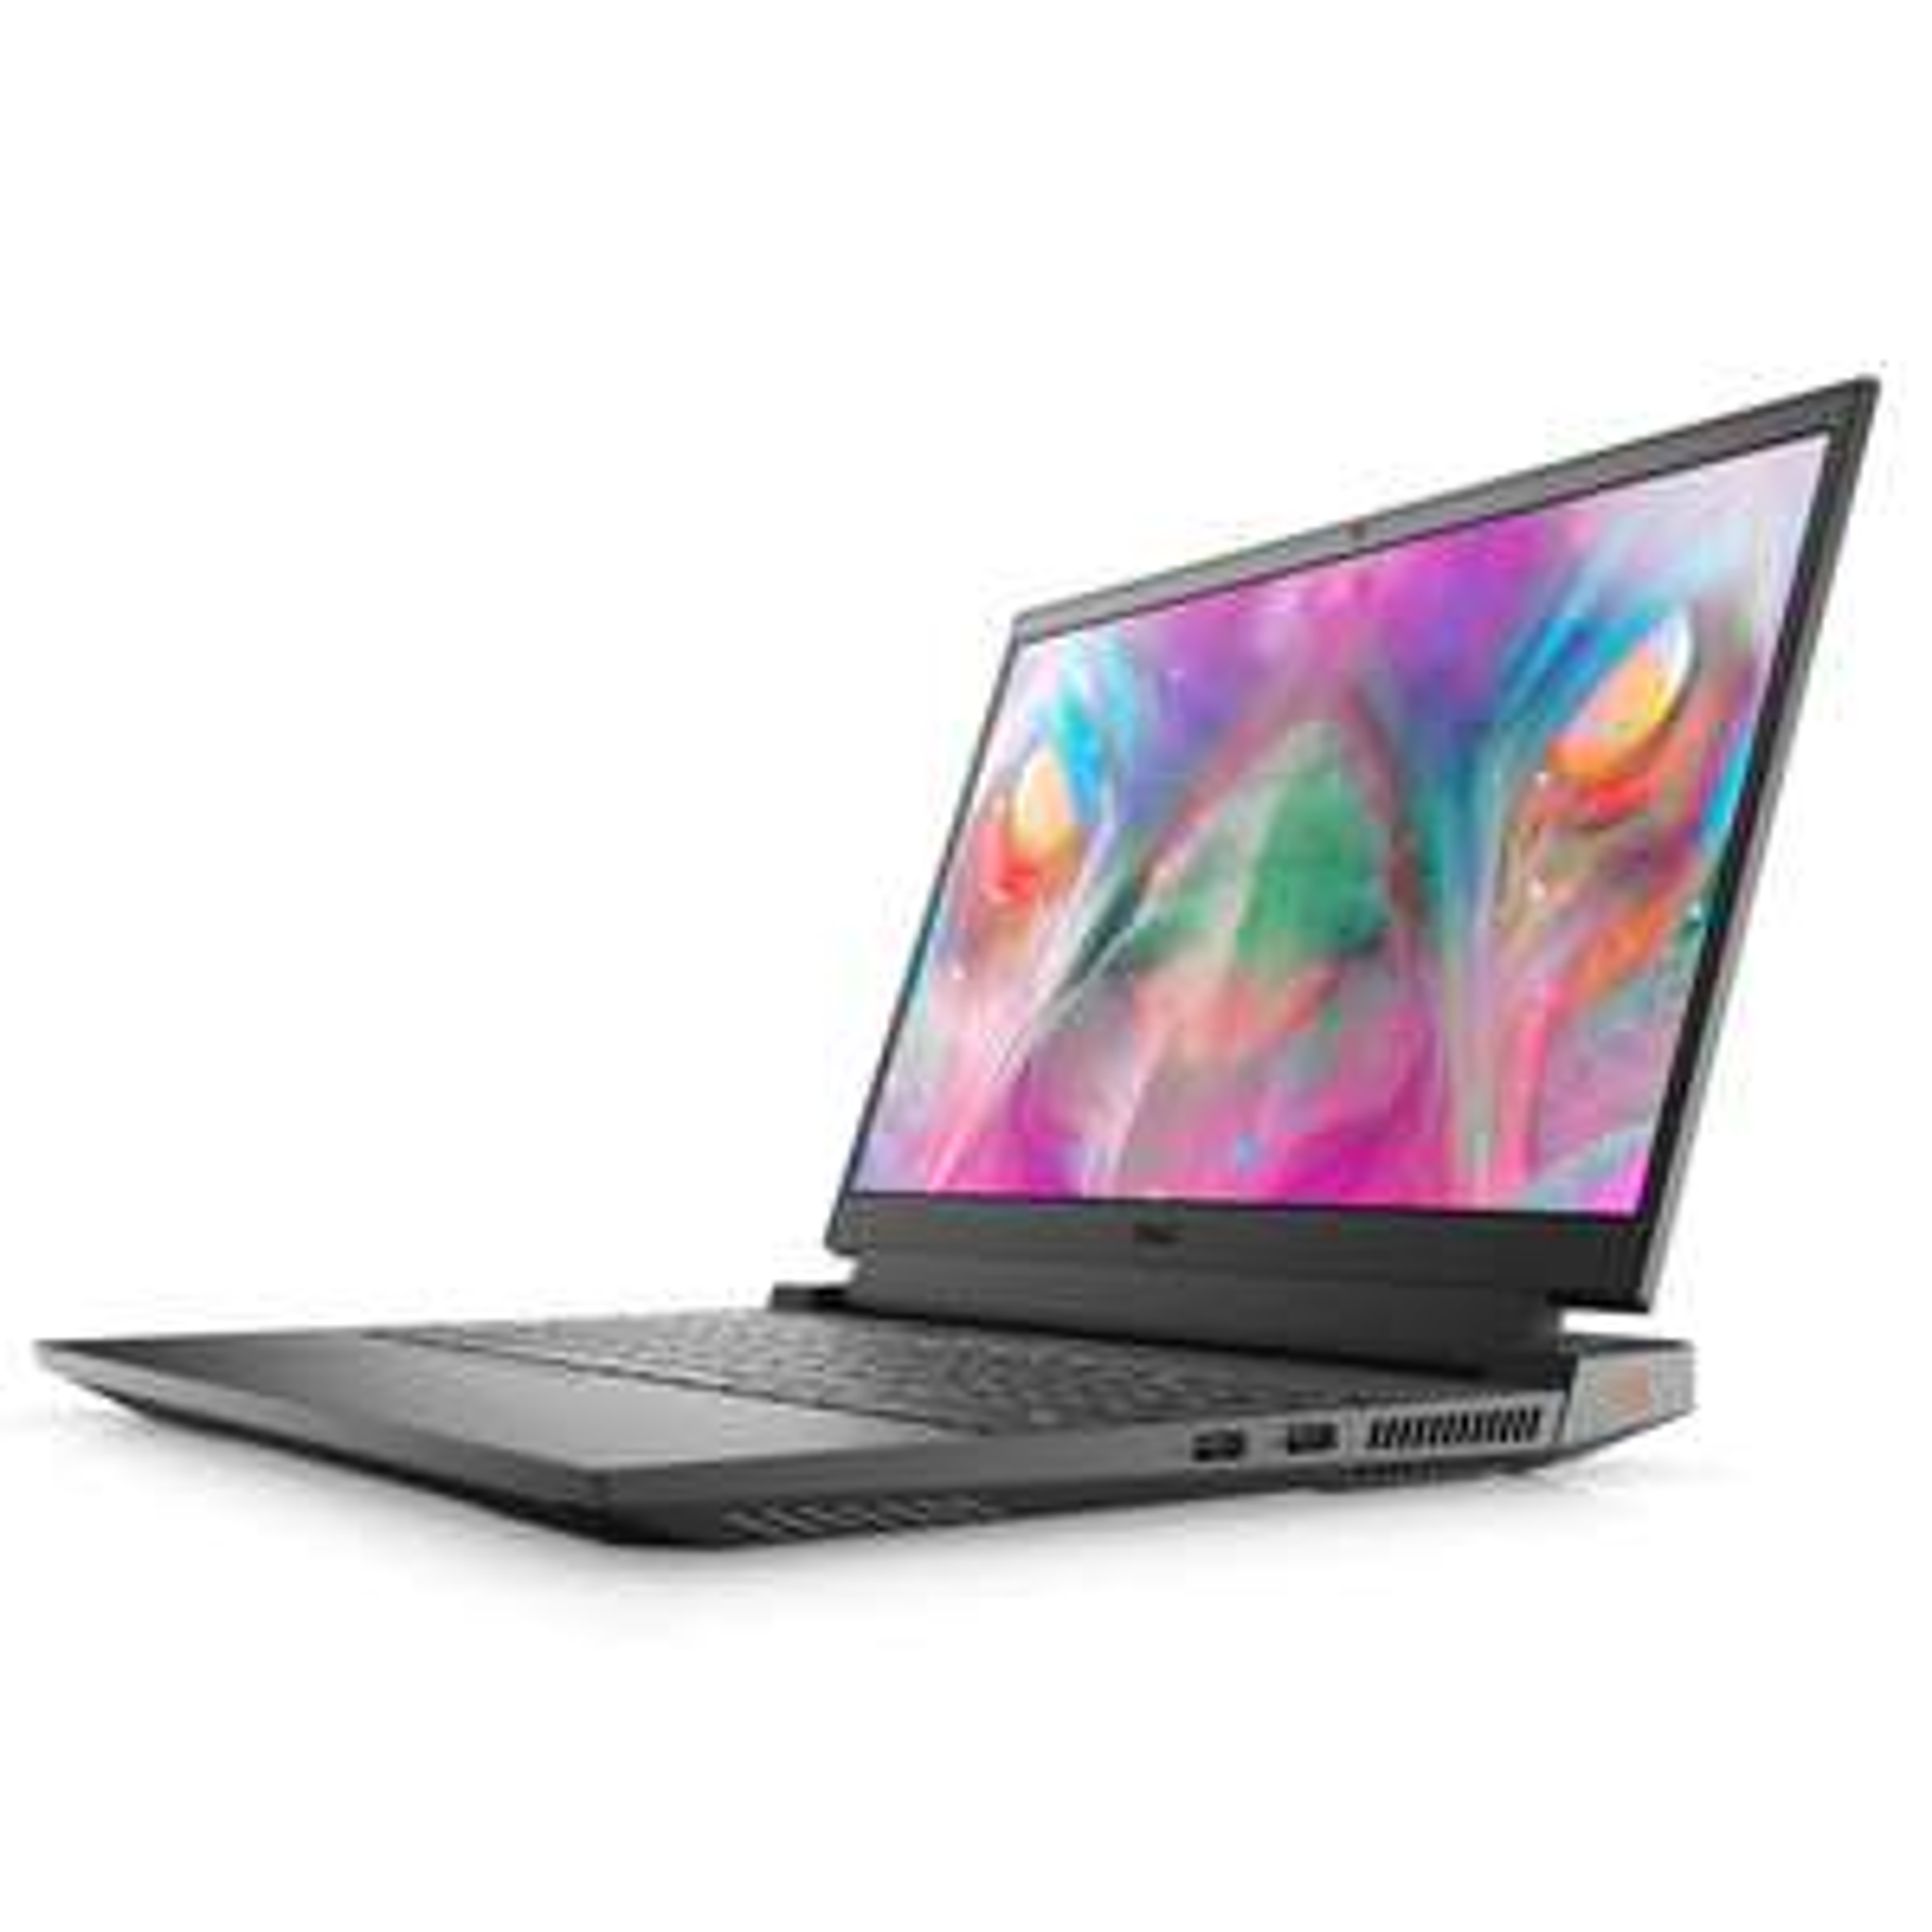 "PC Portable 15.6"" gaming Dell G15 5510 - Full HD 120 Hz, i7-10870H, RAM 16 Go, SSD 512 Go, Windows 10, RTX 3060 6 Go, WiFi 6, Windows 10"